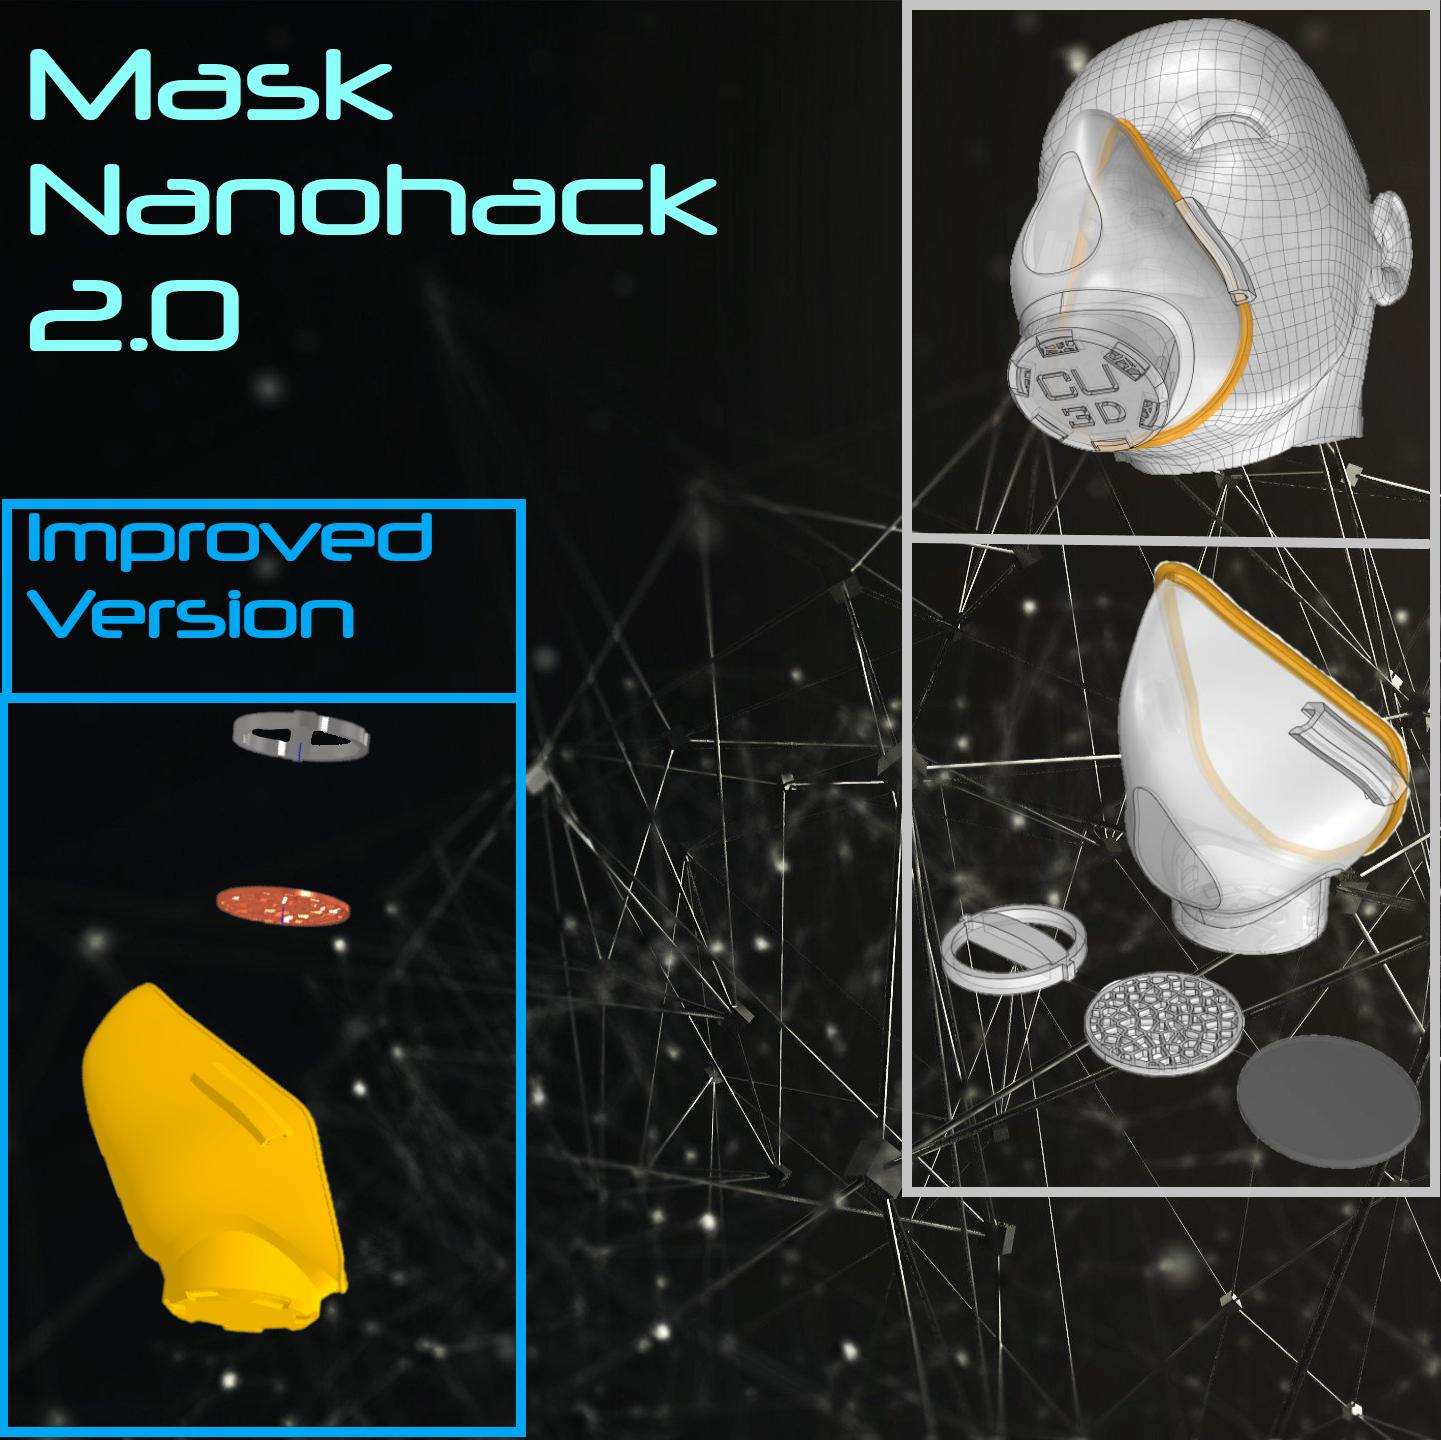 Wallpaper.png Download free STL file Mask 3D NanoHack 2.0 • 3D printer design, Tonystark112